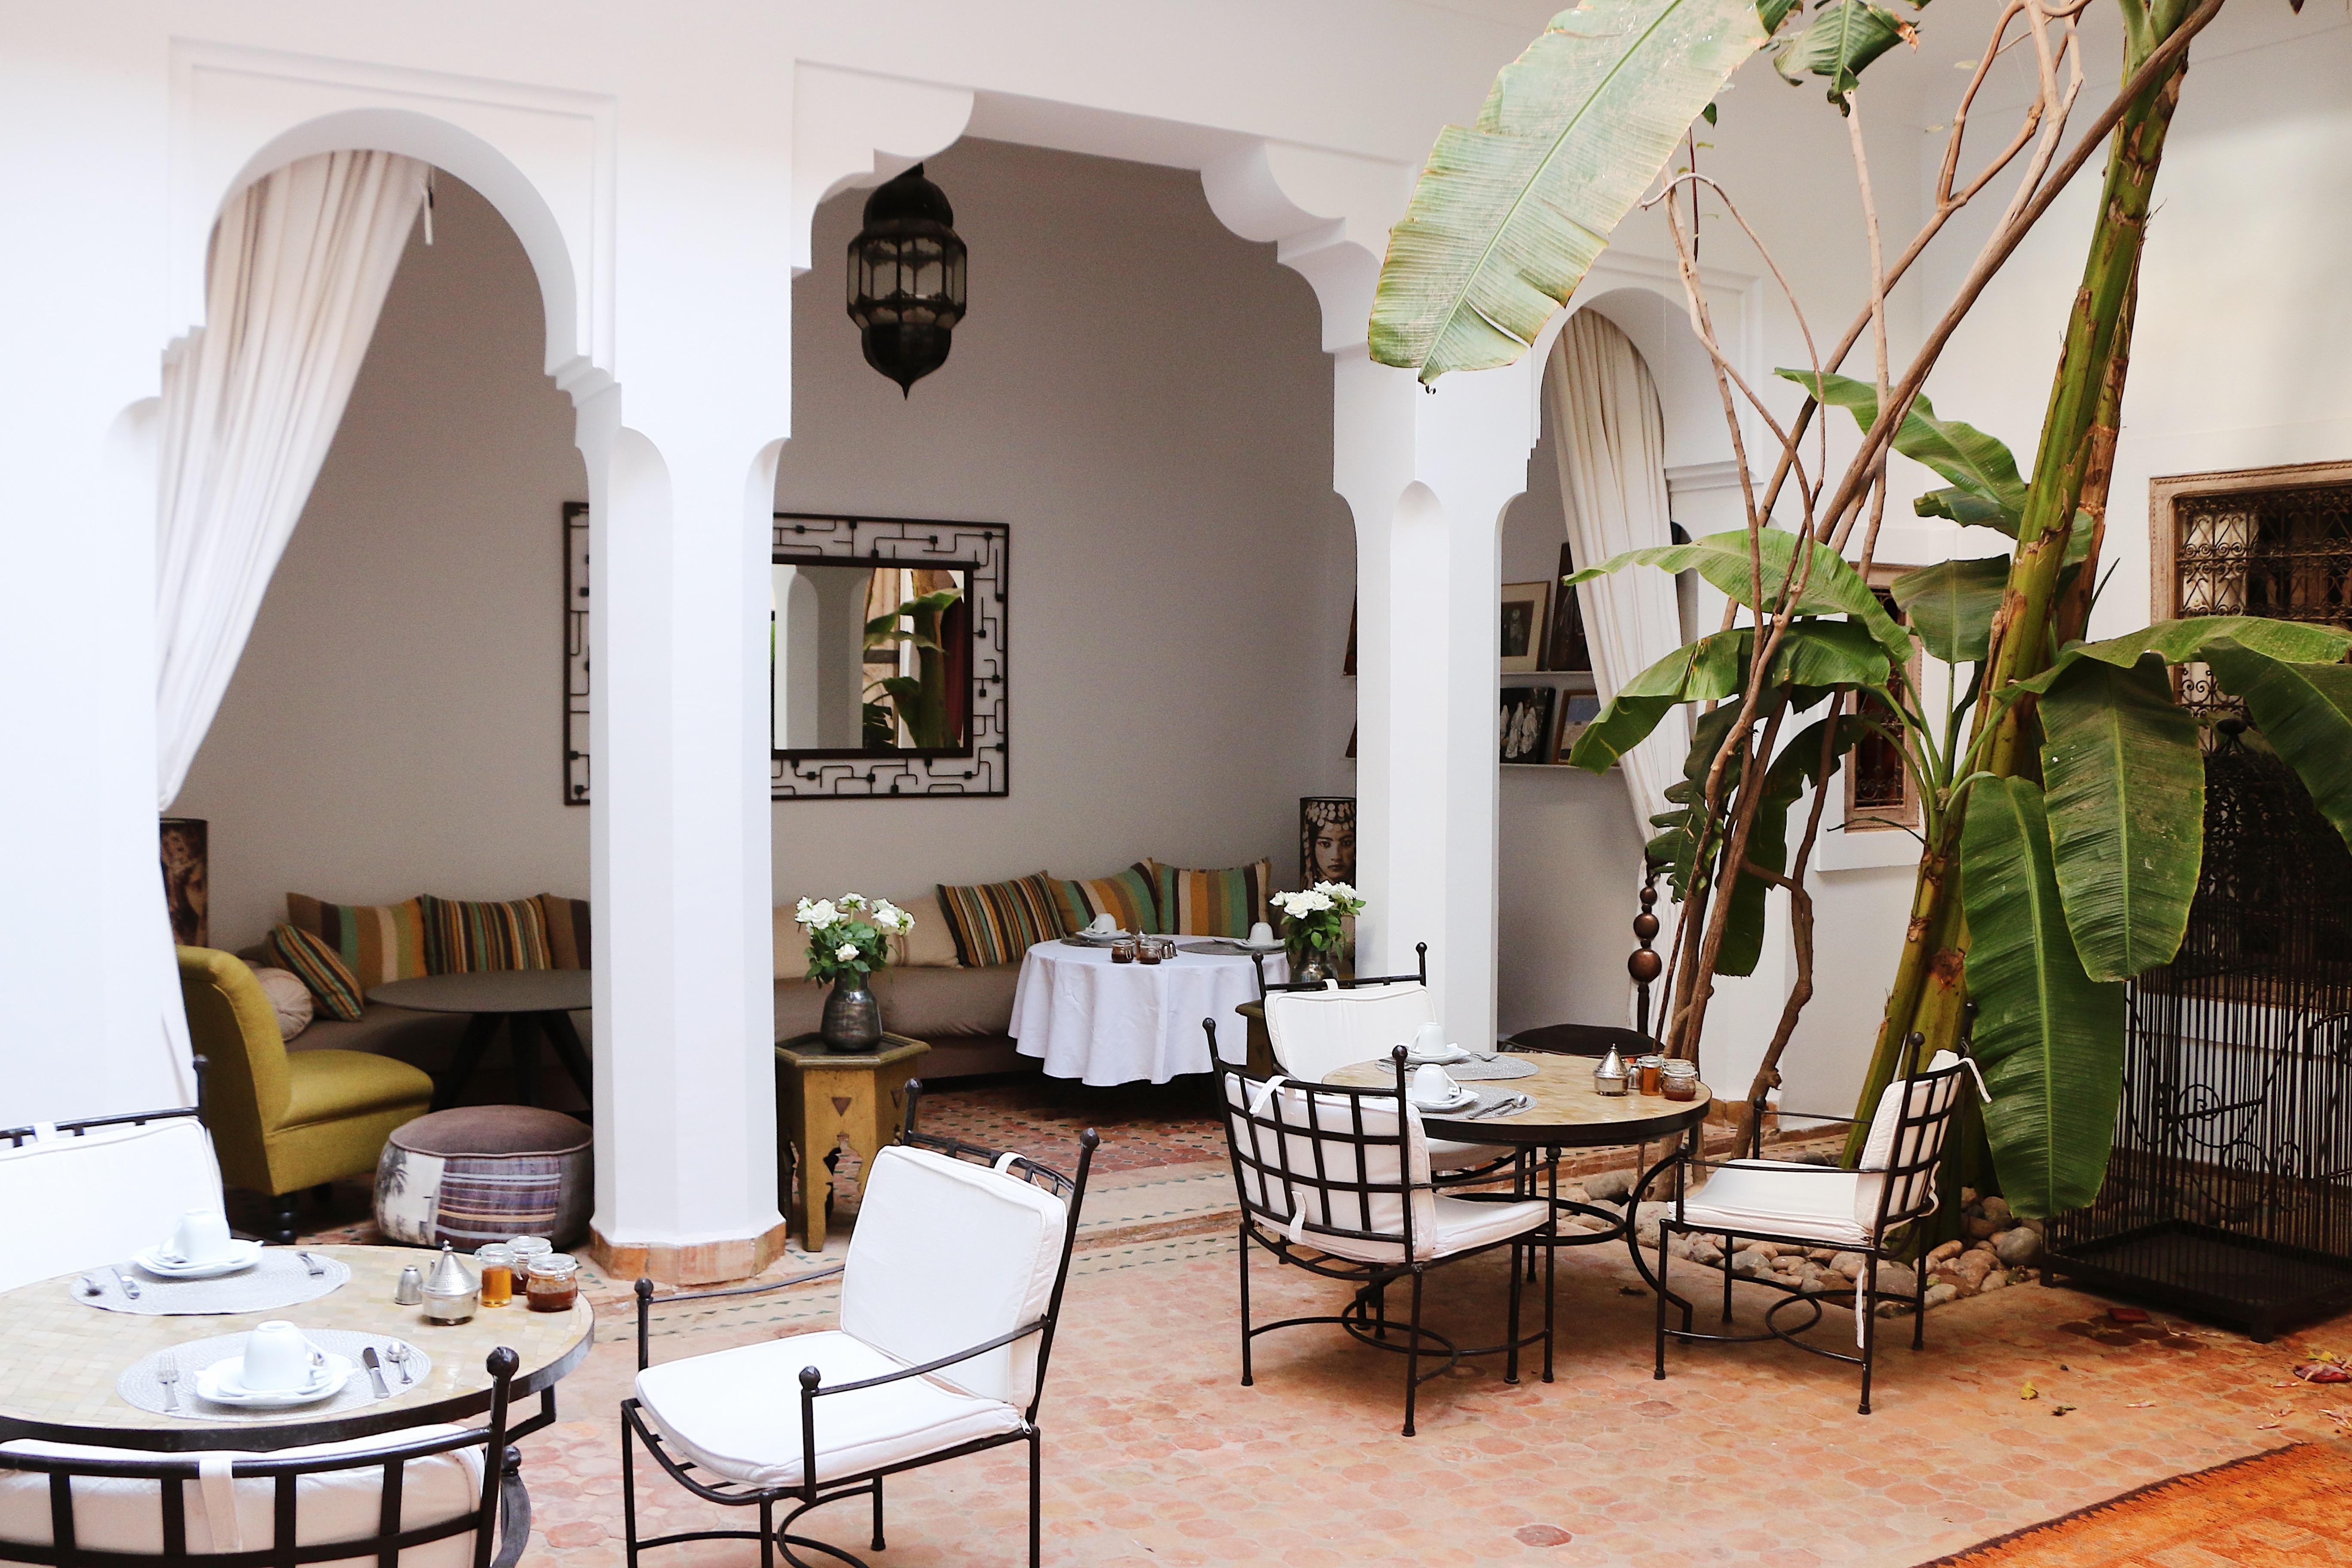 Voyager à Marrakech, Riad Marrakech, médina, hotel, B&B Marrakech, patio riad, décoration riad